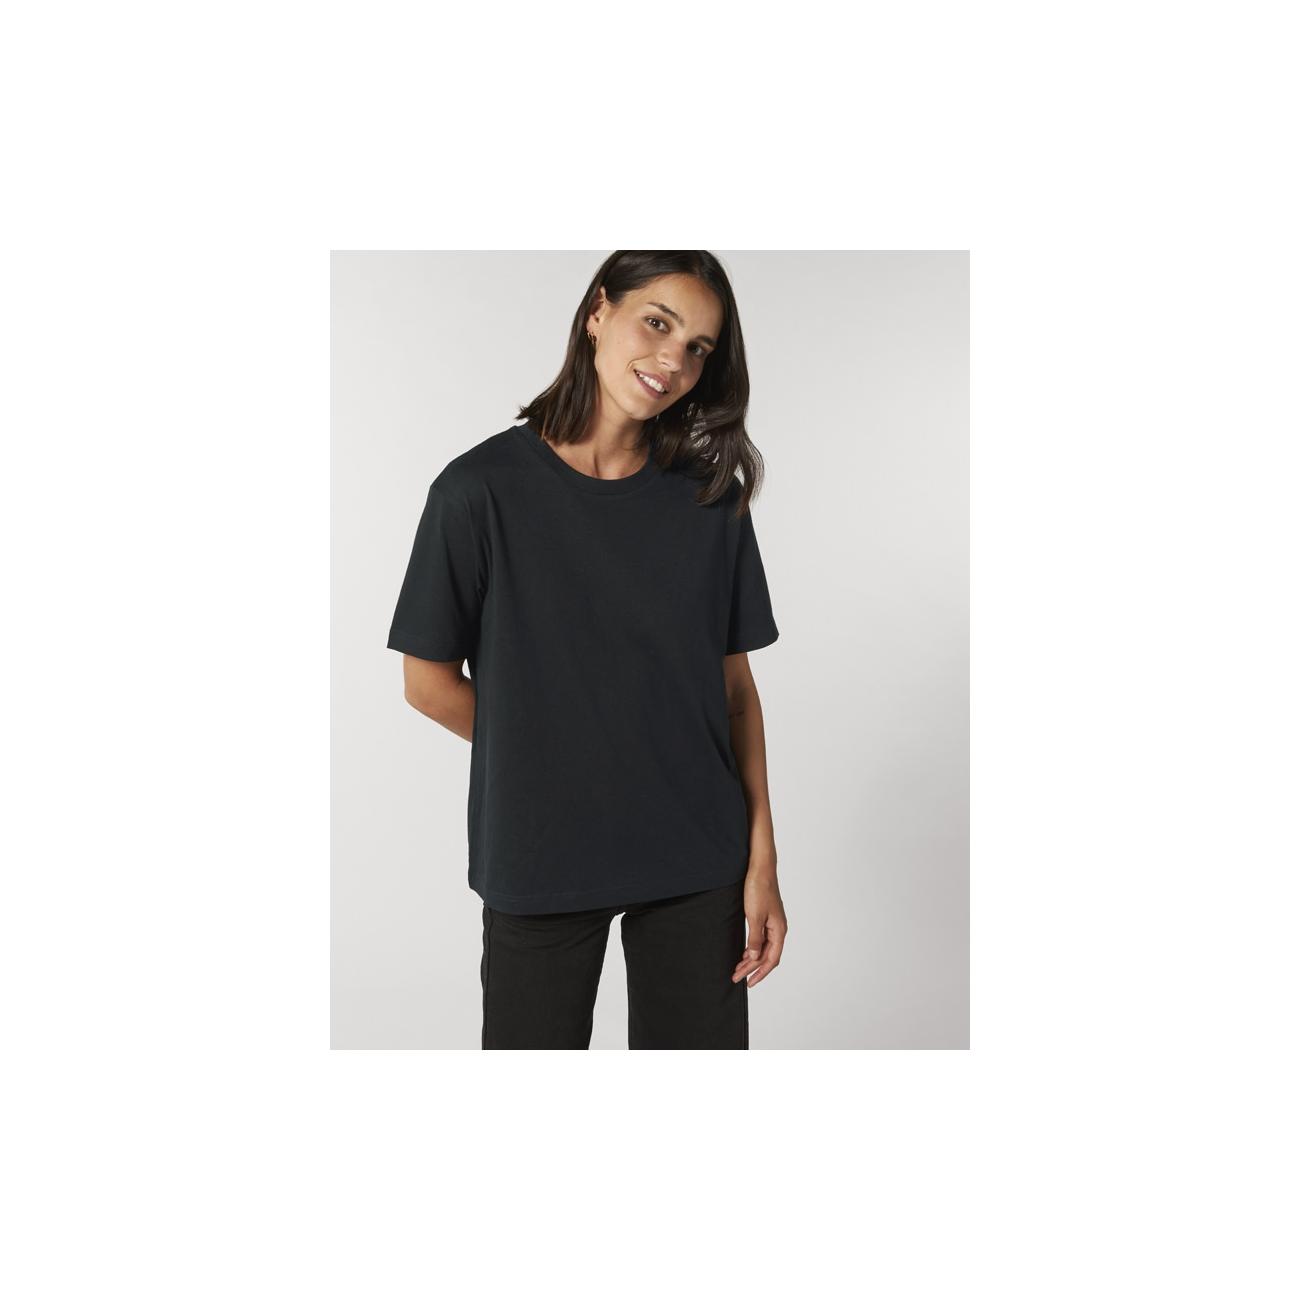 https://tee-shirt-bio.com/9693-thickbox_default/tee-shirt-coupe-ample-femme-coton-bio-noir.jpg